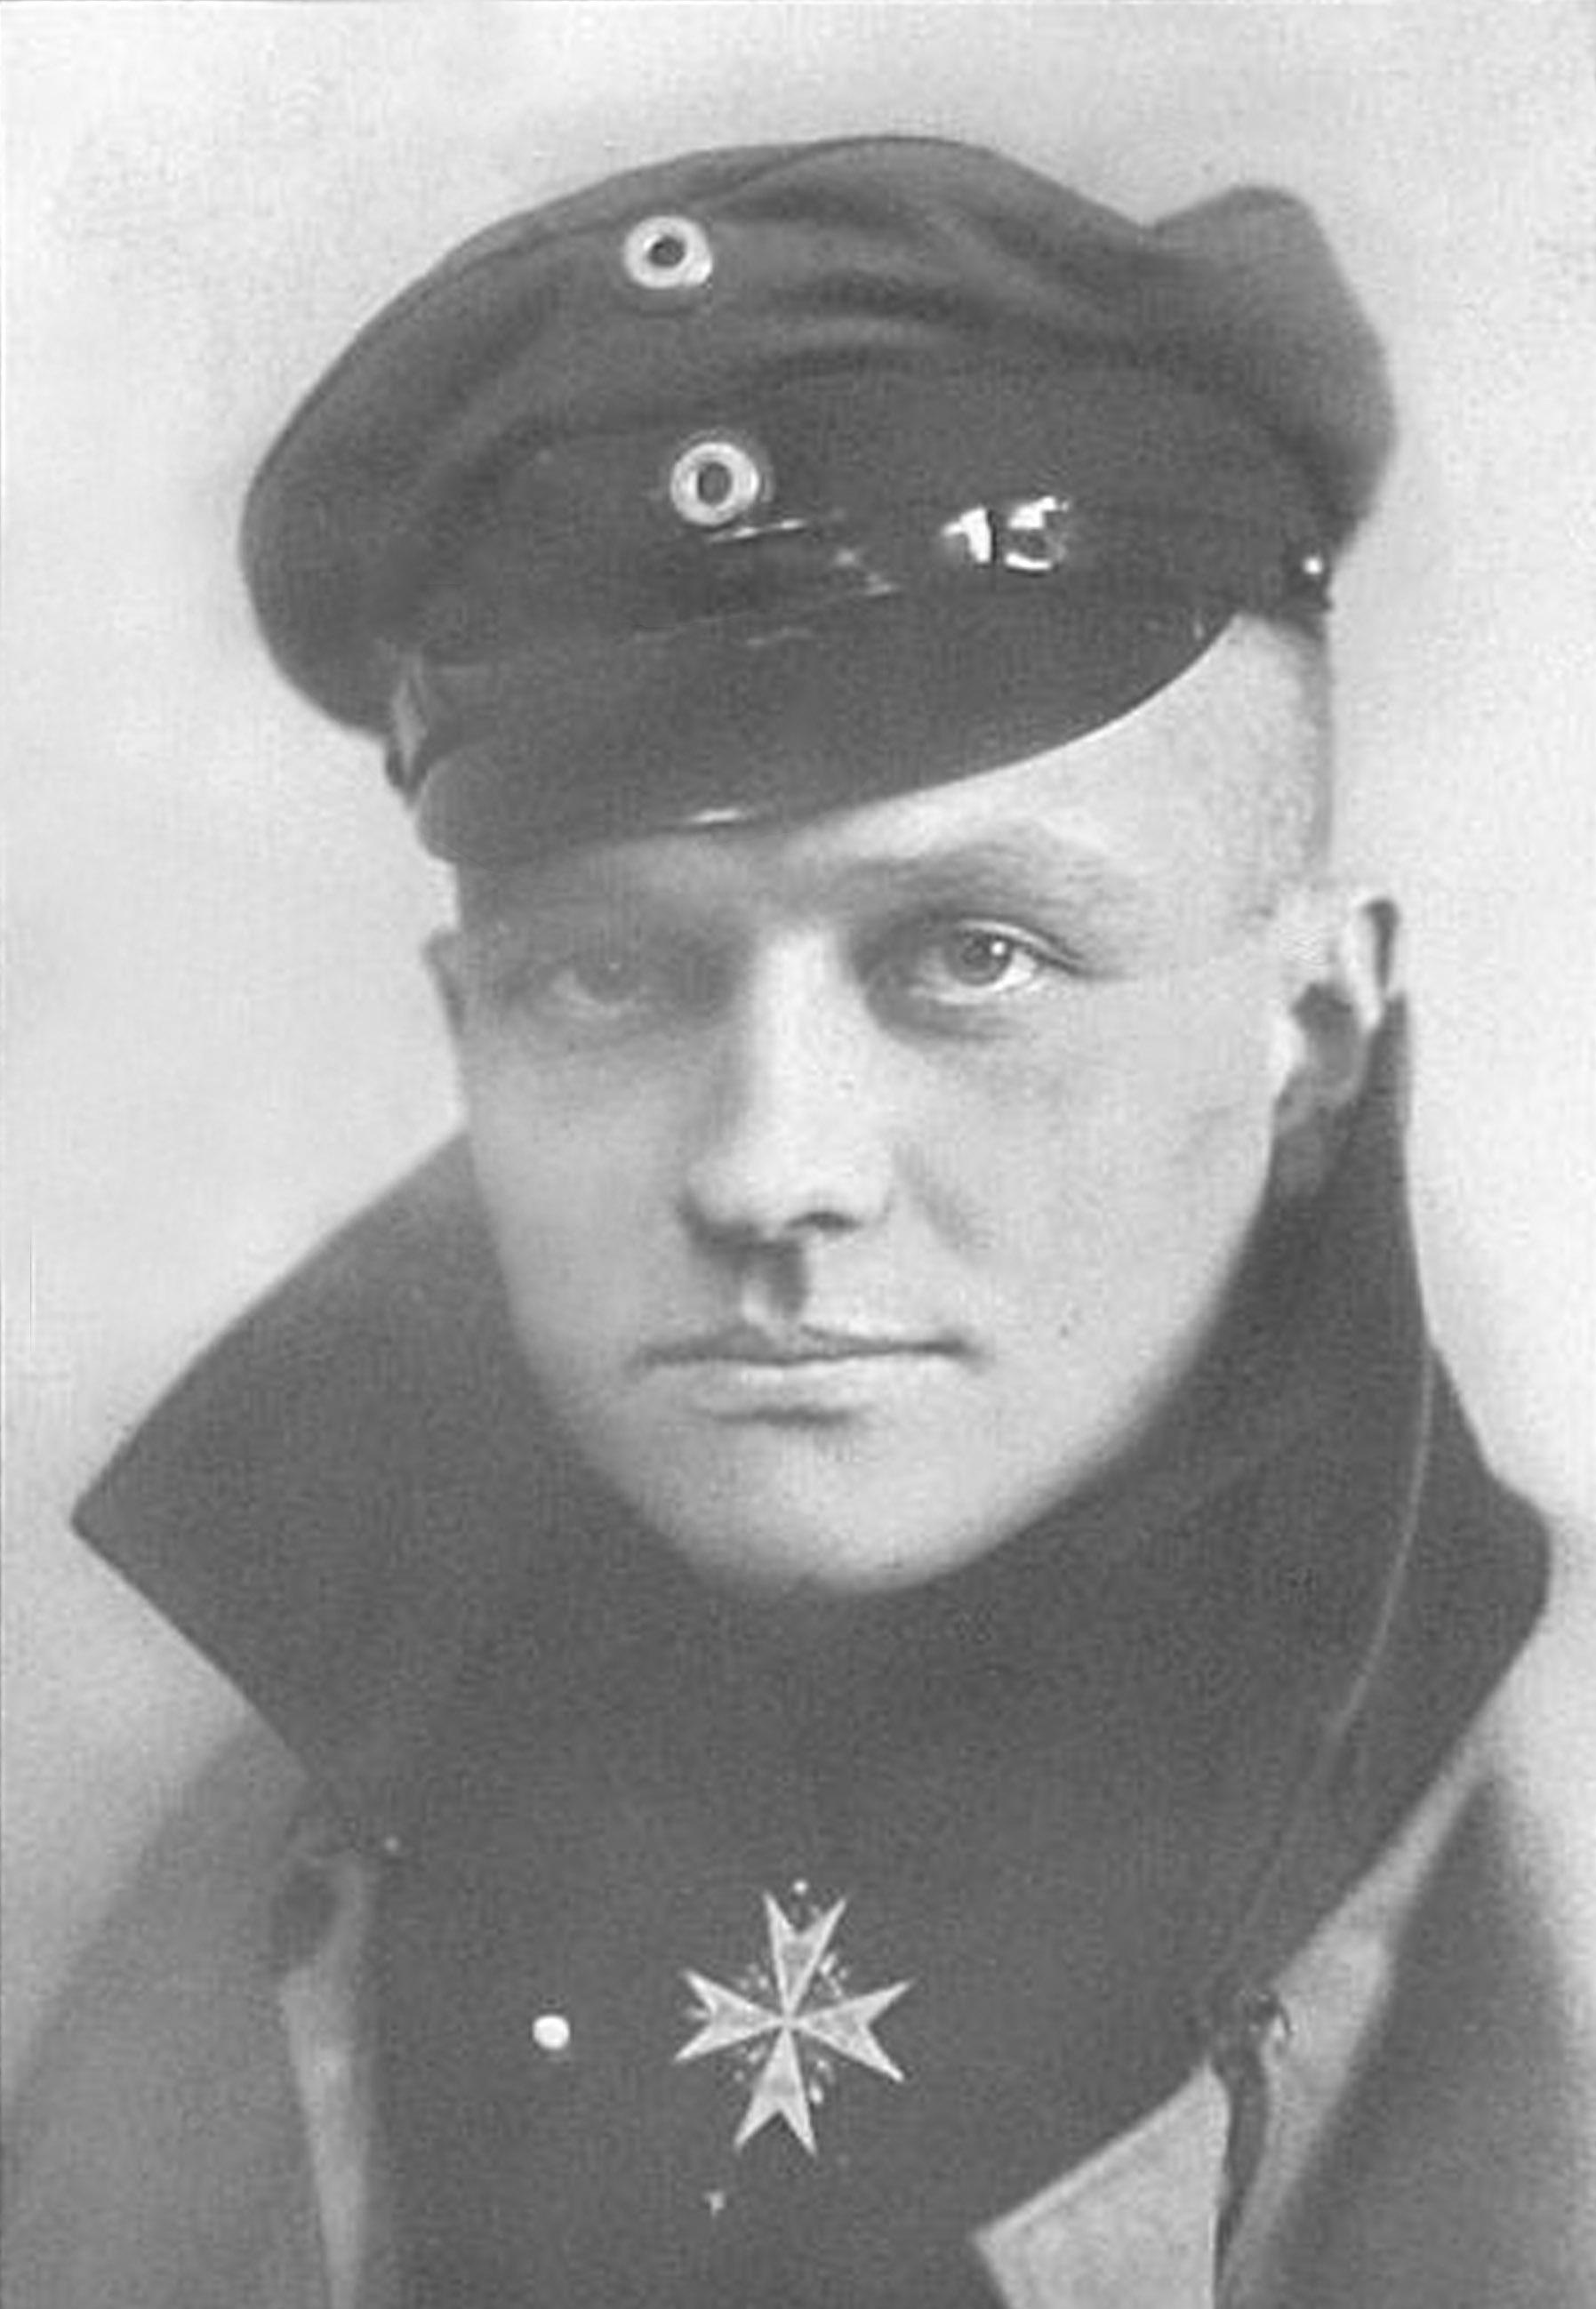 Héroes de Guerra: von Richthofen, Manfred (El Barón Rojo)